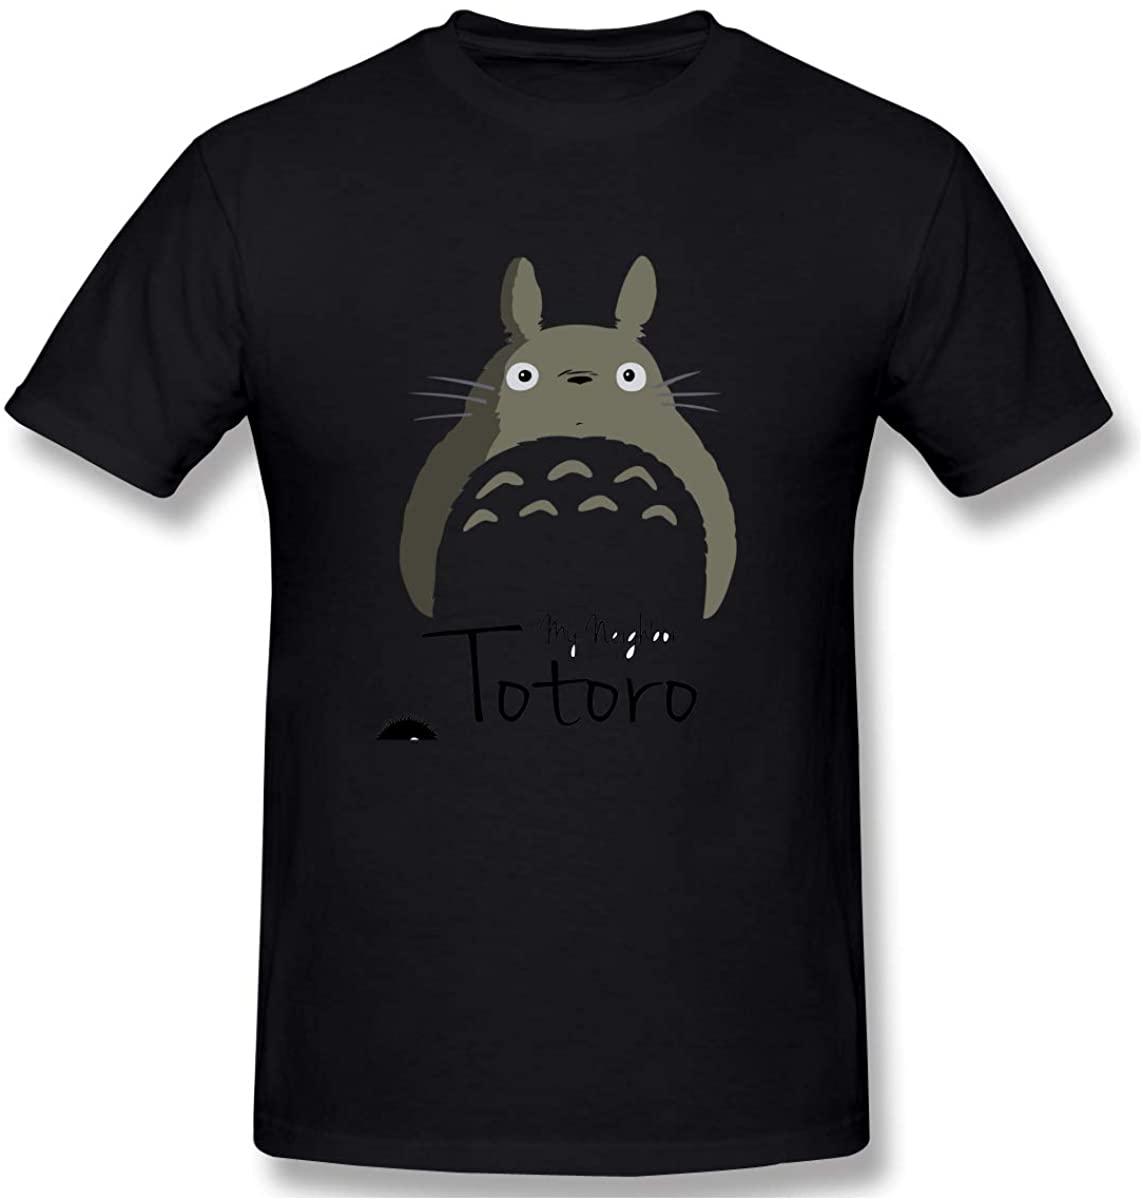 XIVEIER Geek Miyazaki Tonari No Totoro T Shirt for Man Black M.